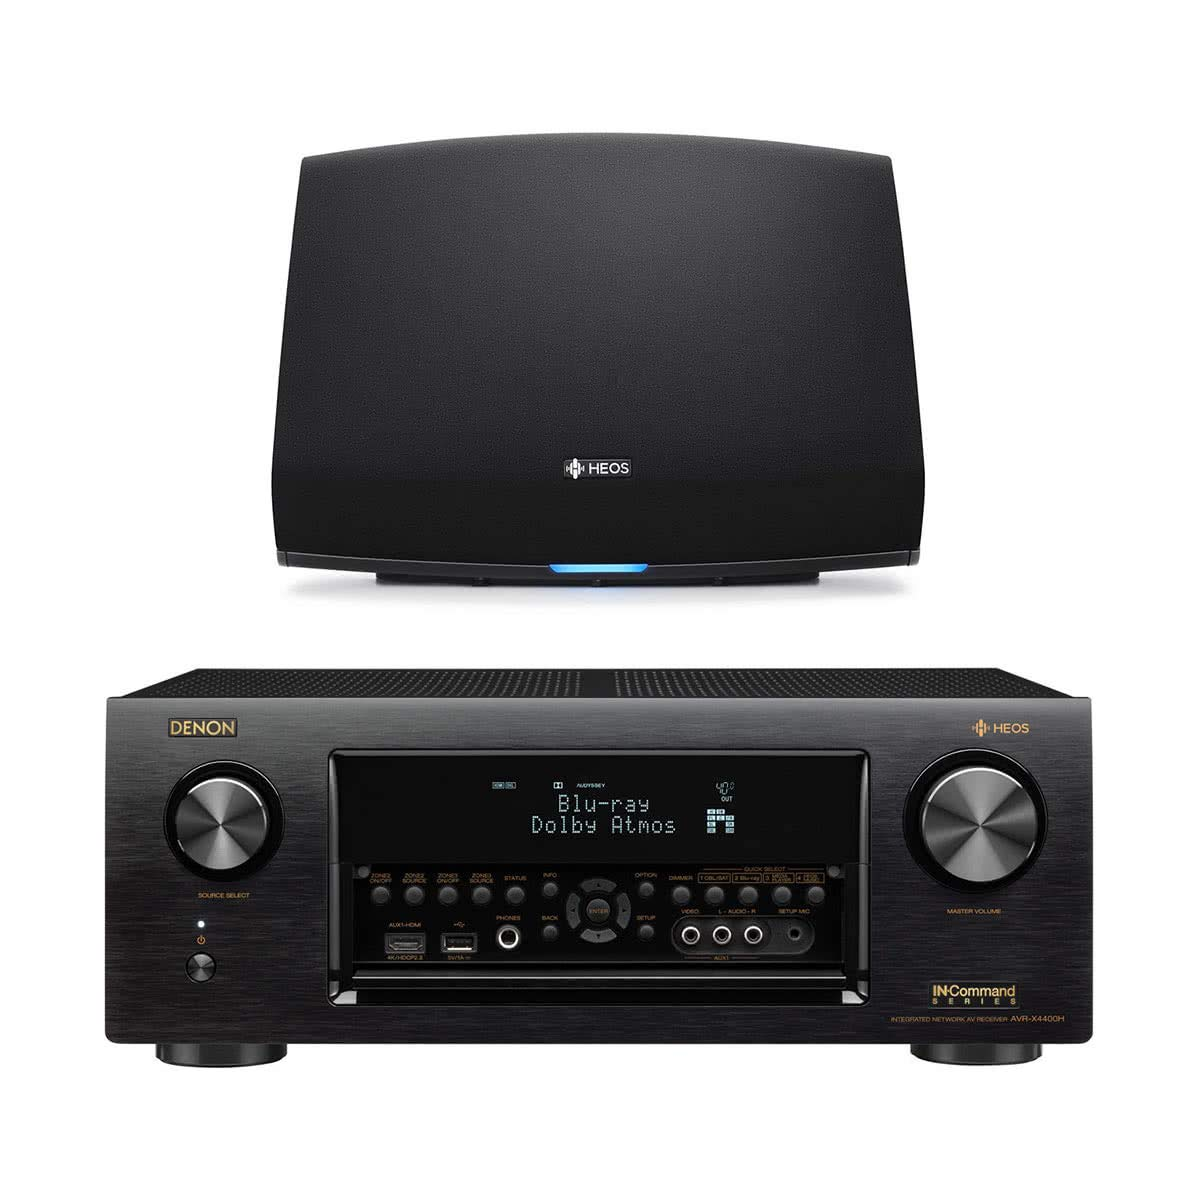 Denon AVR-X4400H 9 2 Channel Full 4K Ultra HD Network AV Receiver with HEOS  5 Wireless Streaming Speaker - Series 2 (Black)